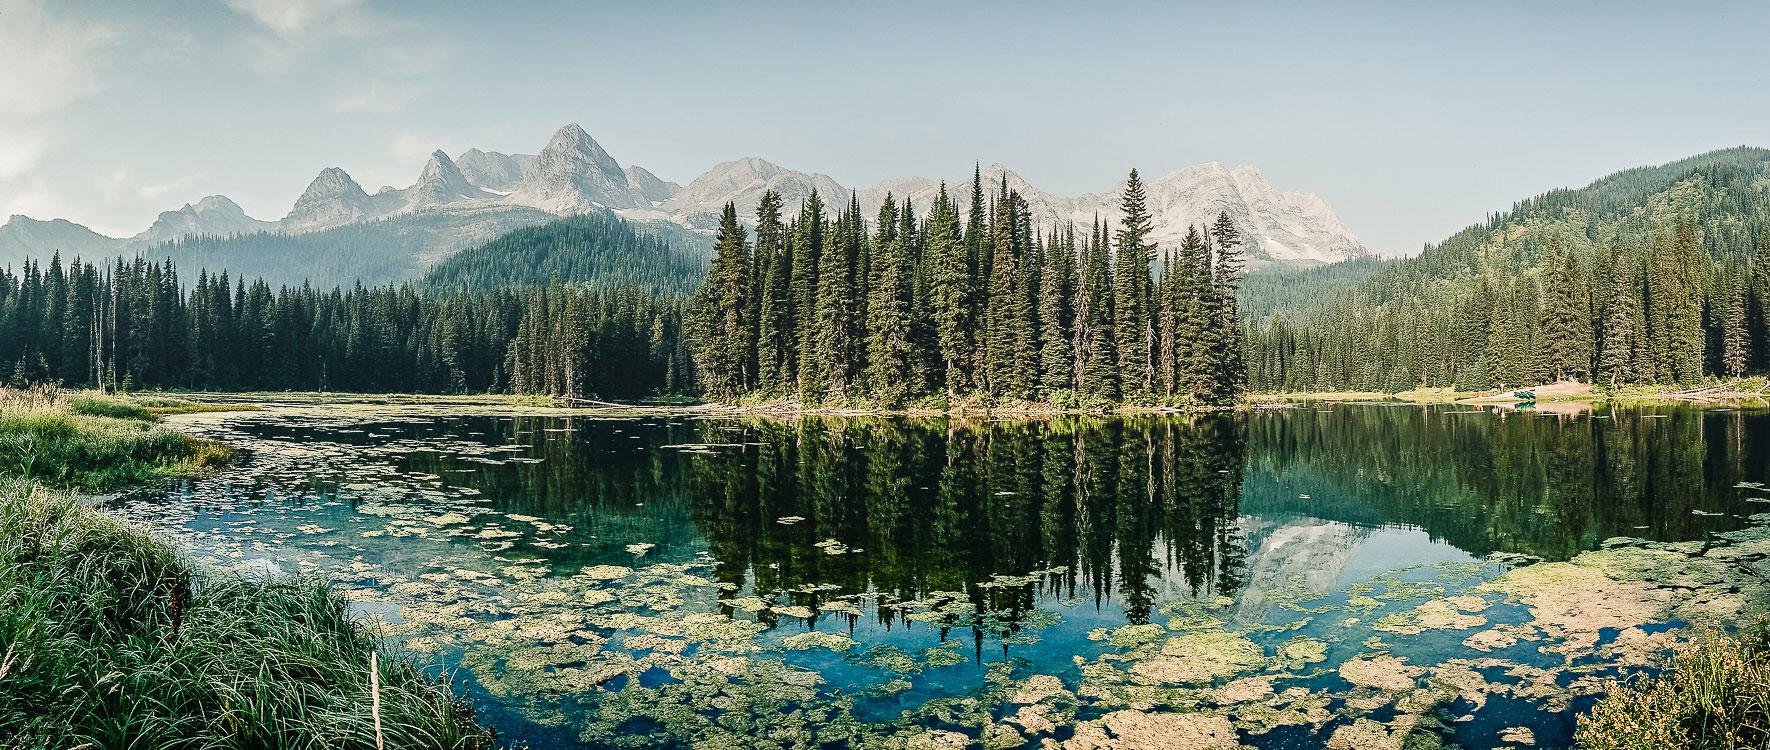 Traumhafter Island Lake Kanada